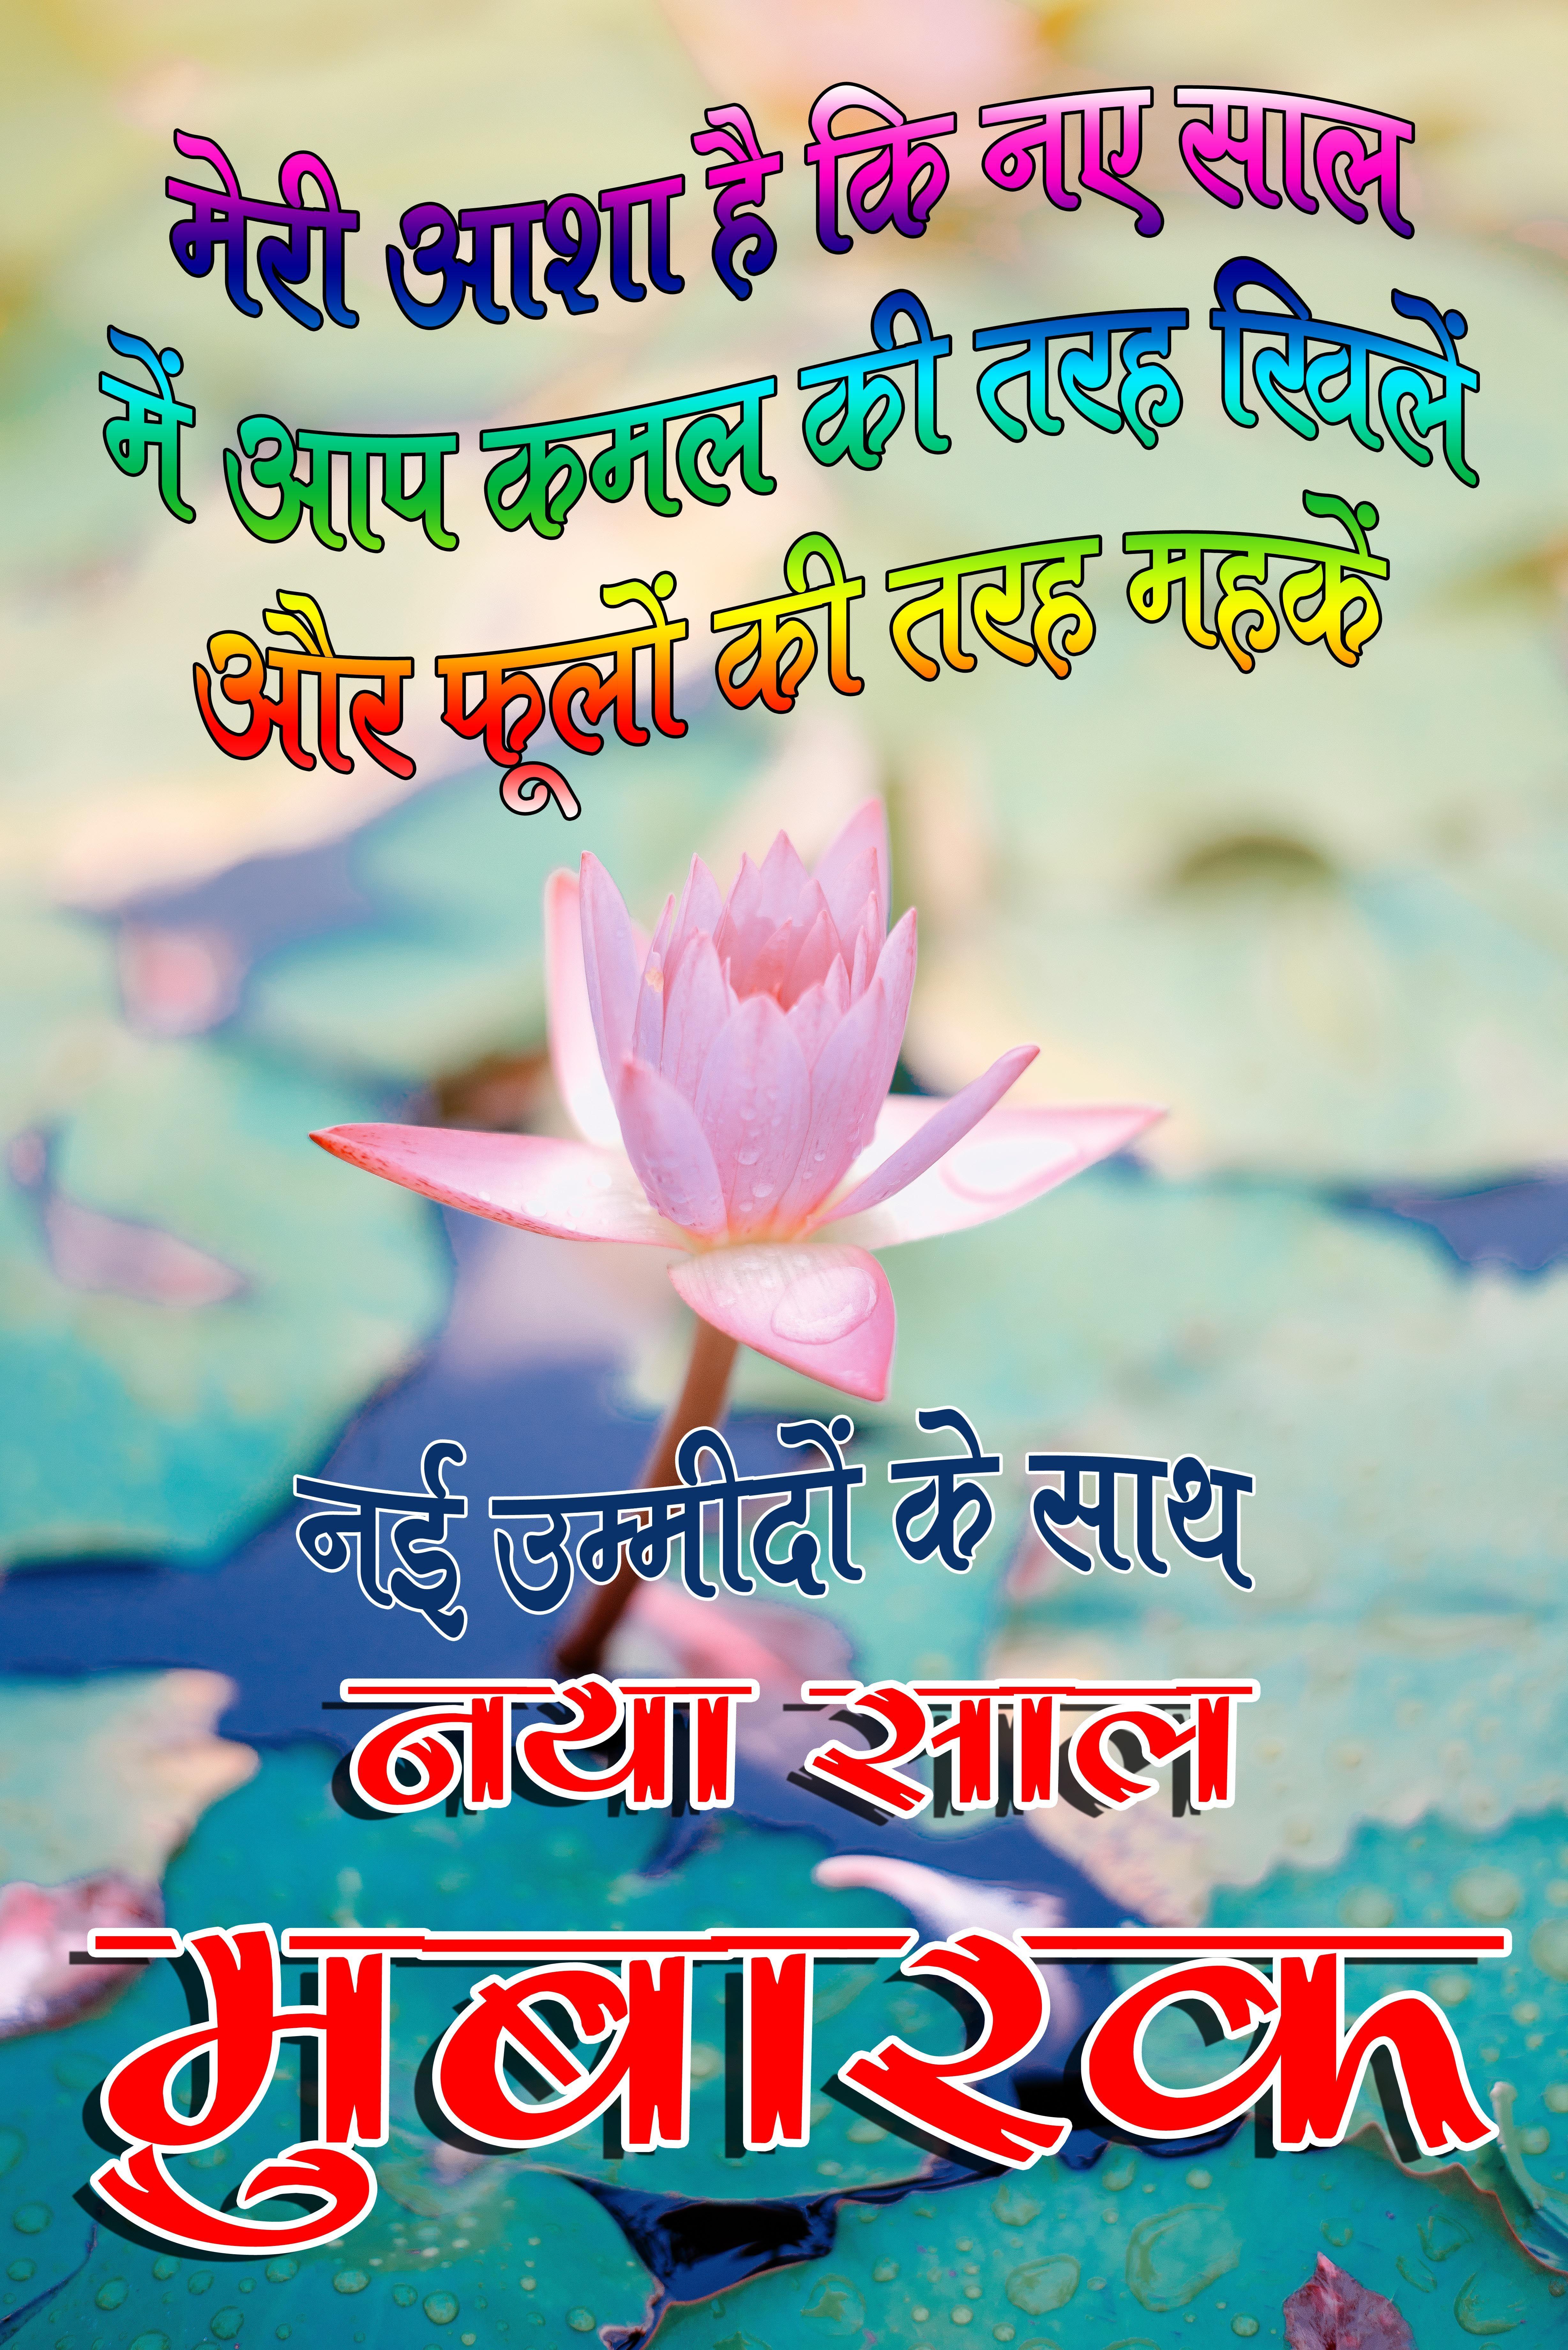 Happy new year hindi mein Hindi new year, New year